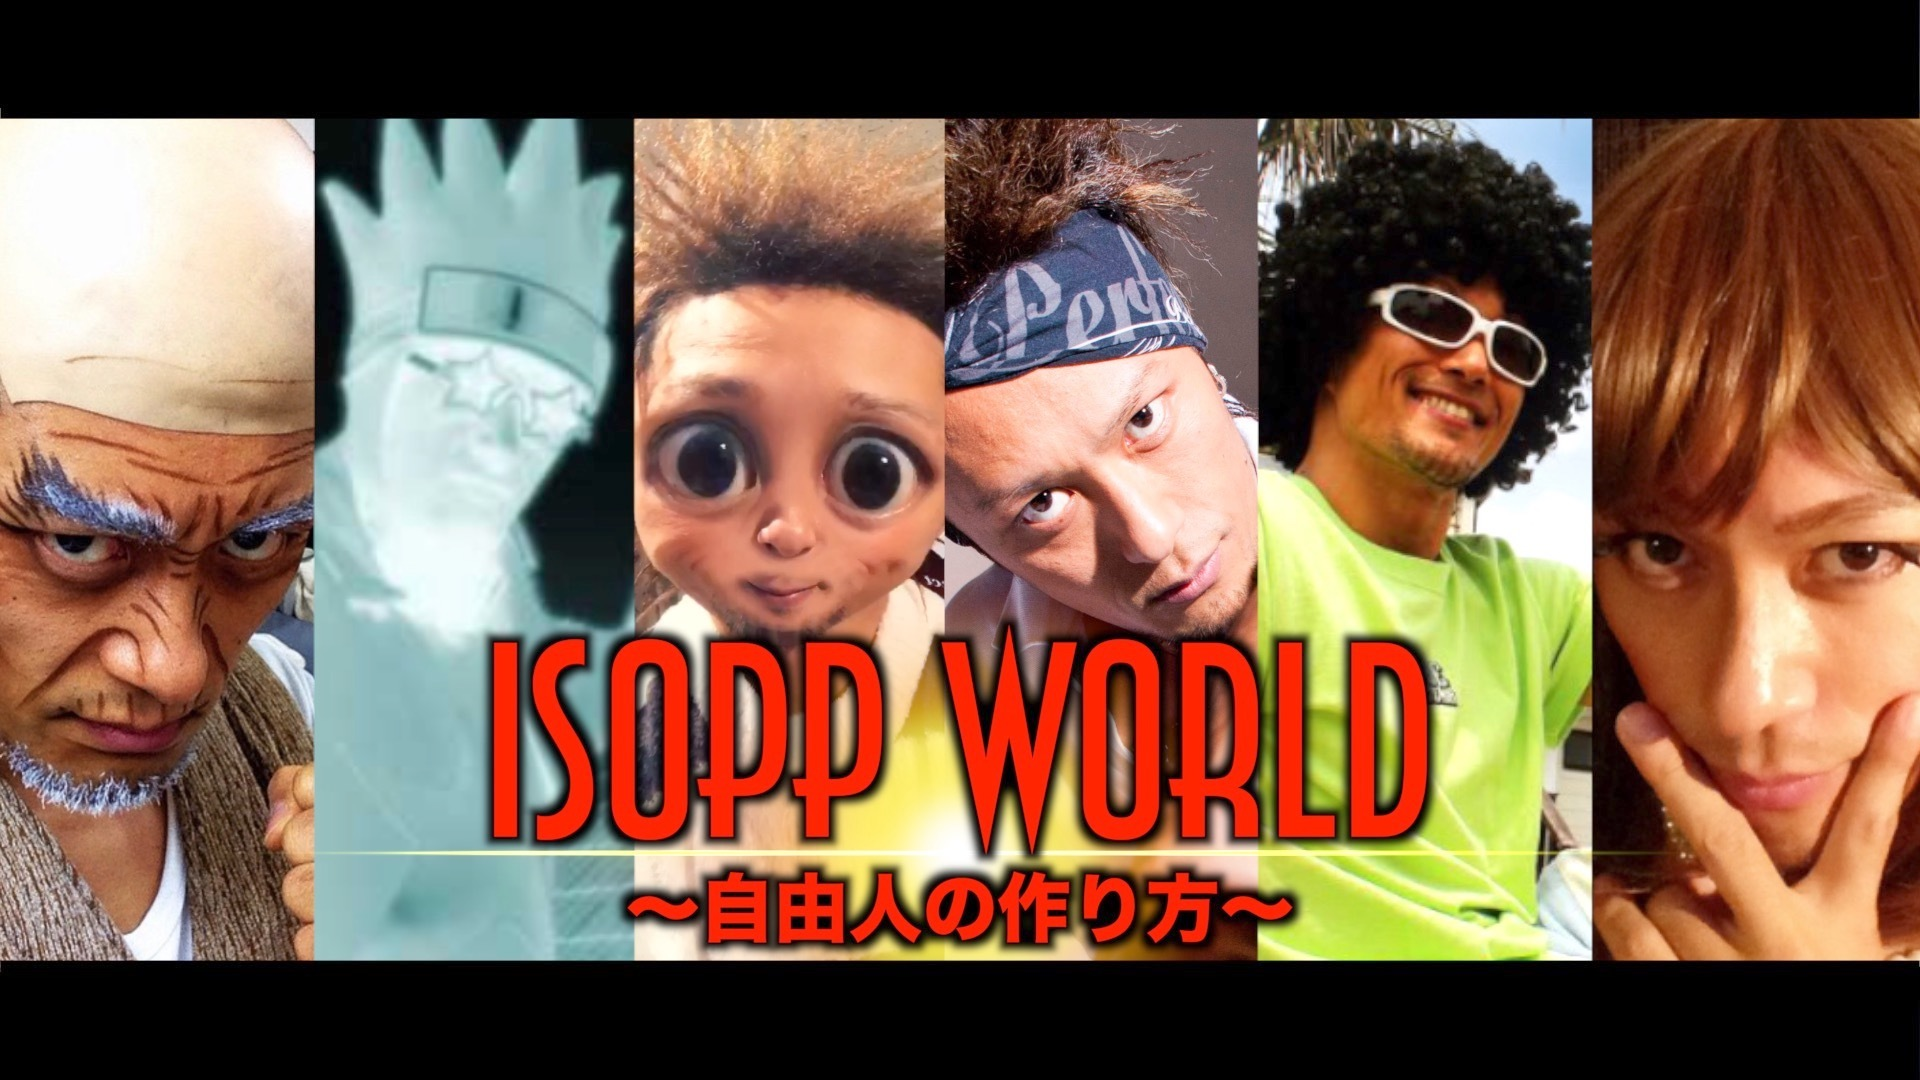 ISOPP